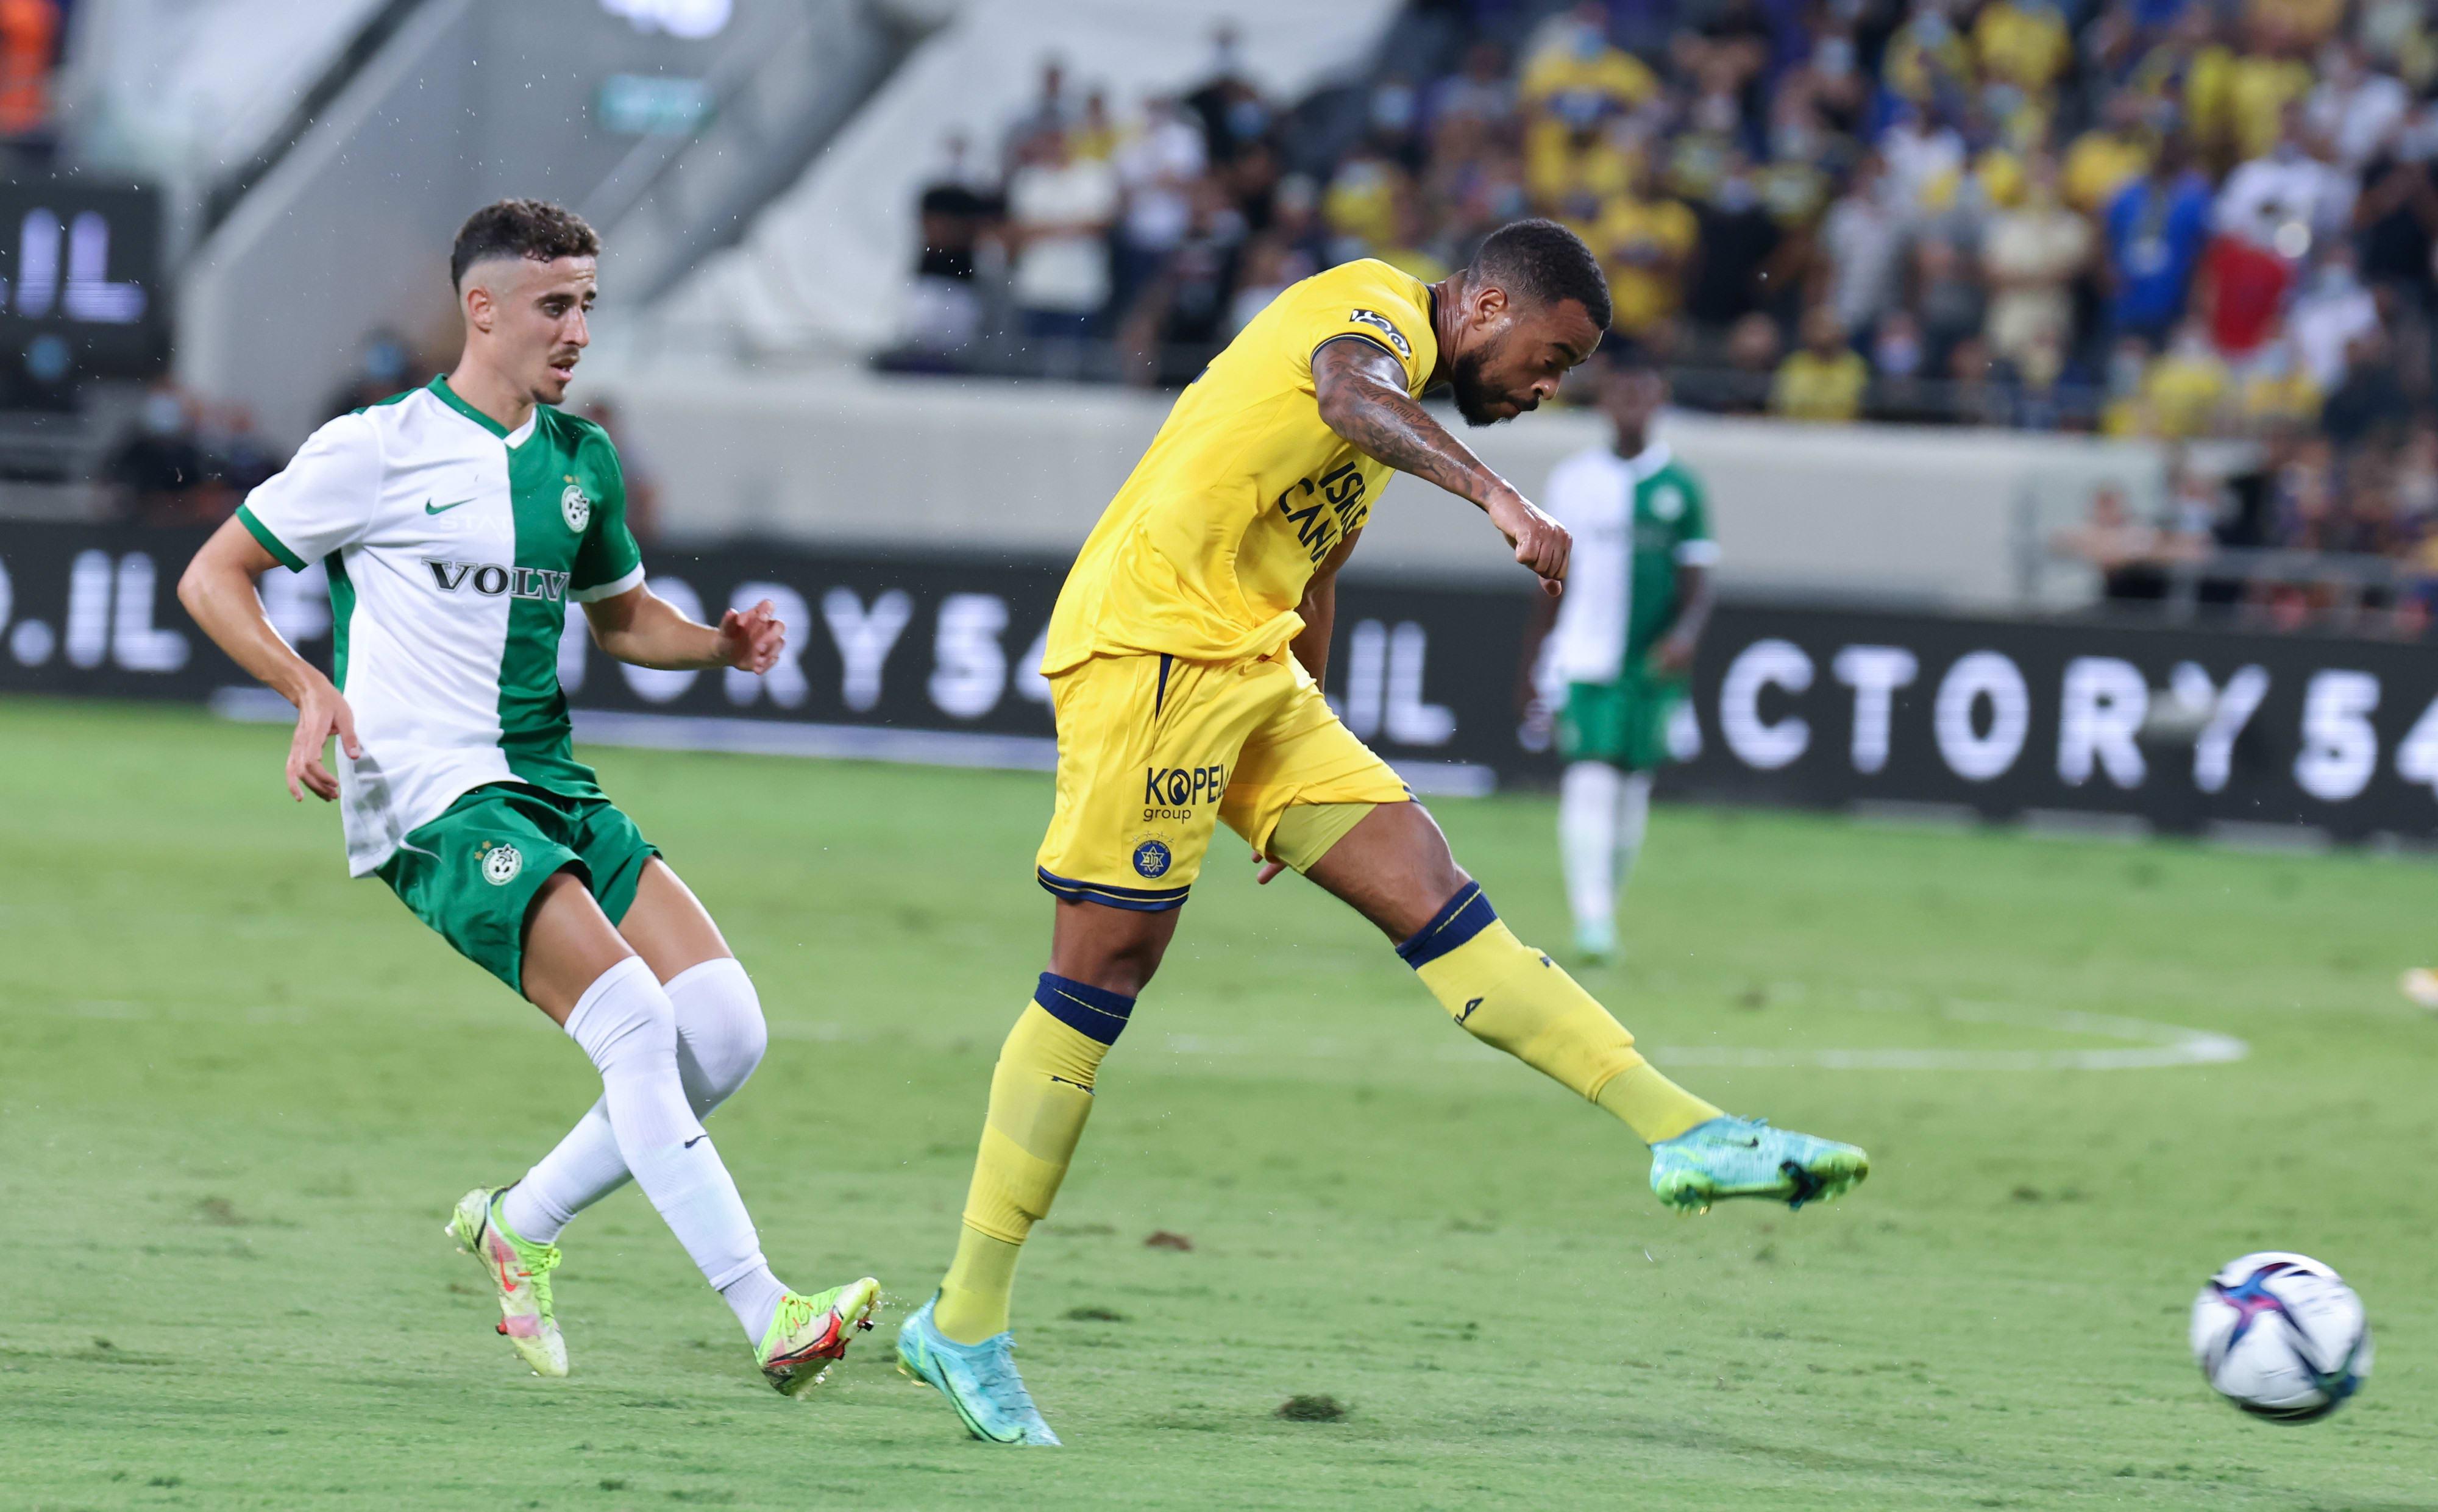 Maccabi Tel Aviv player Brandley Kobas kicks Maccabi Haifa player Dolev Haziza